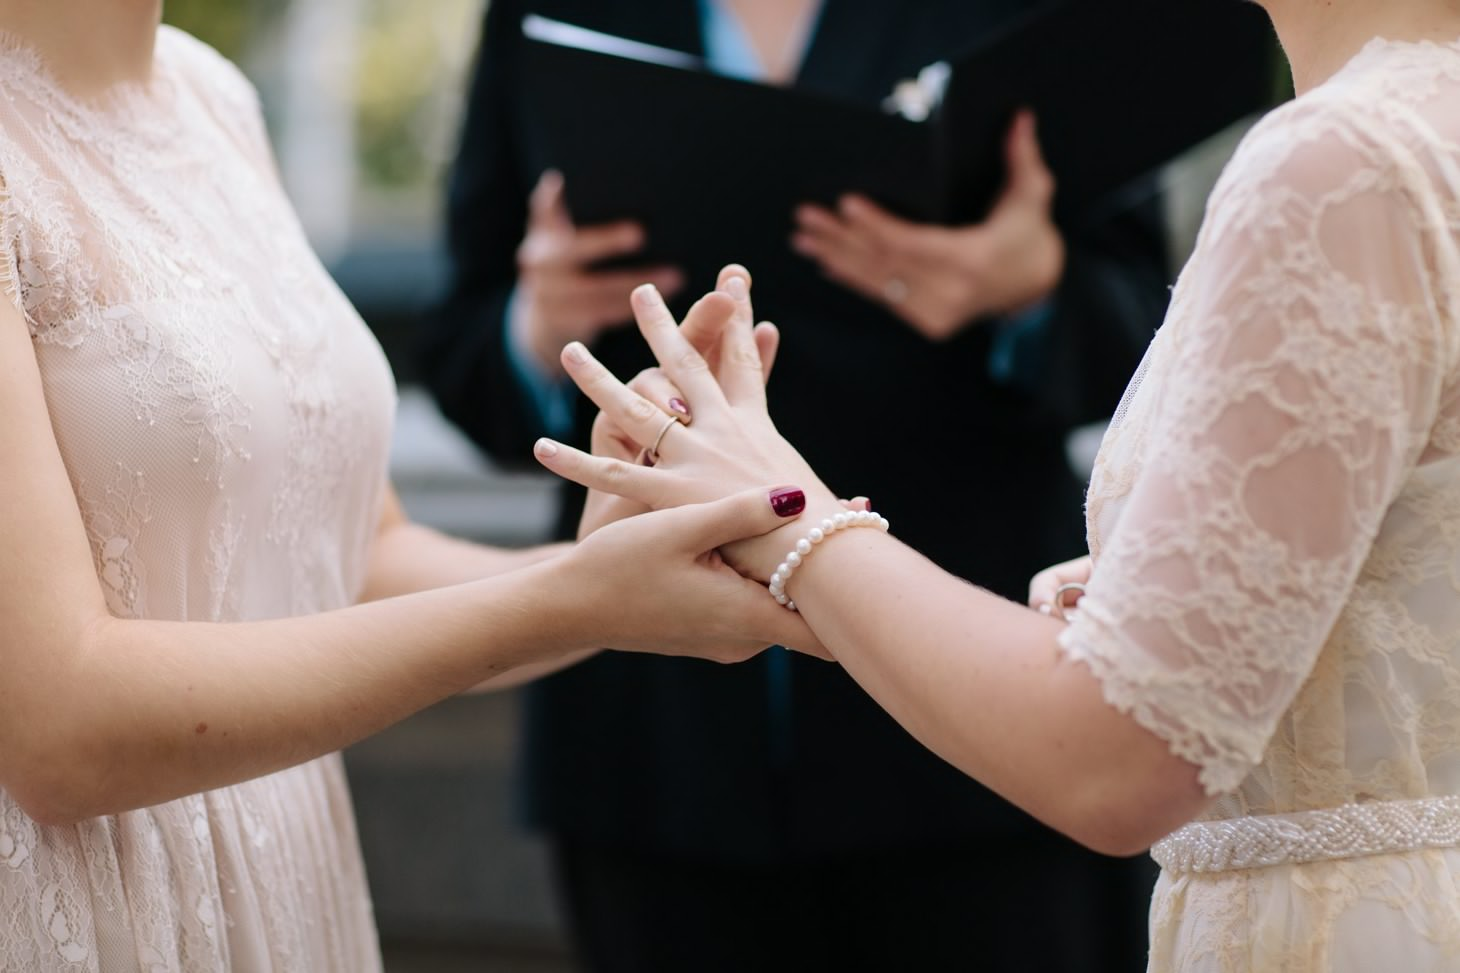 005-nyc-wedding-elopement-lgbt-friendly-photographer-city-hall-grand-central.jpg